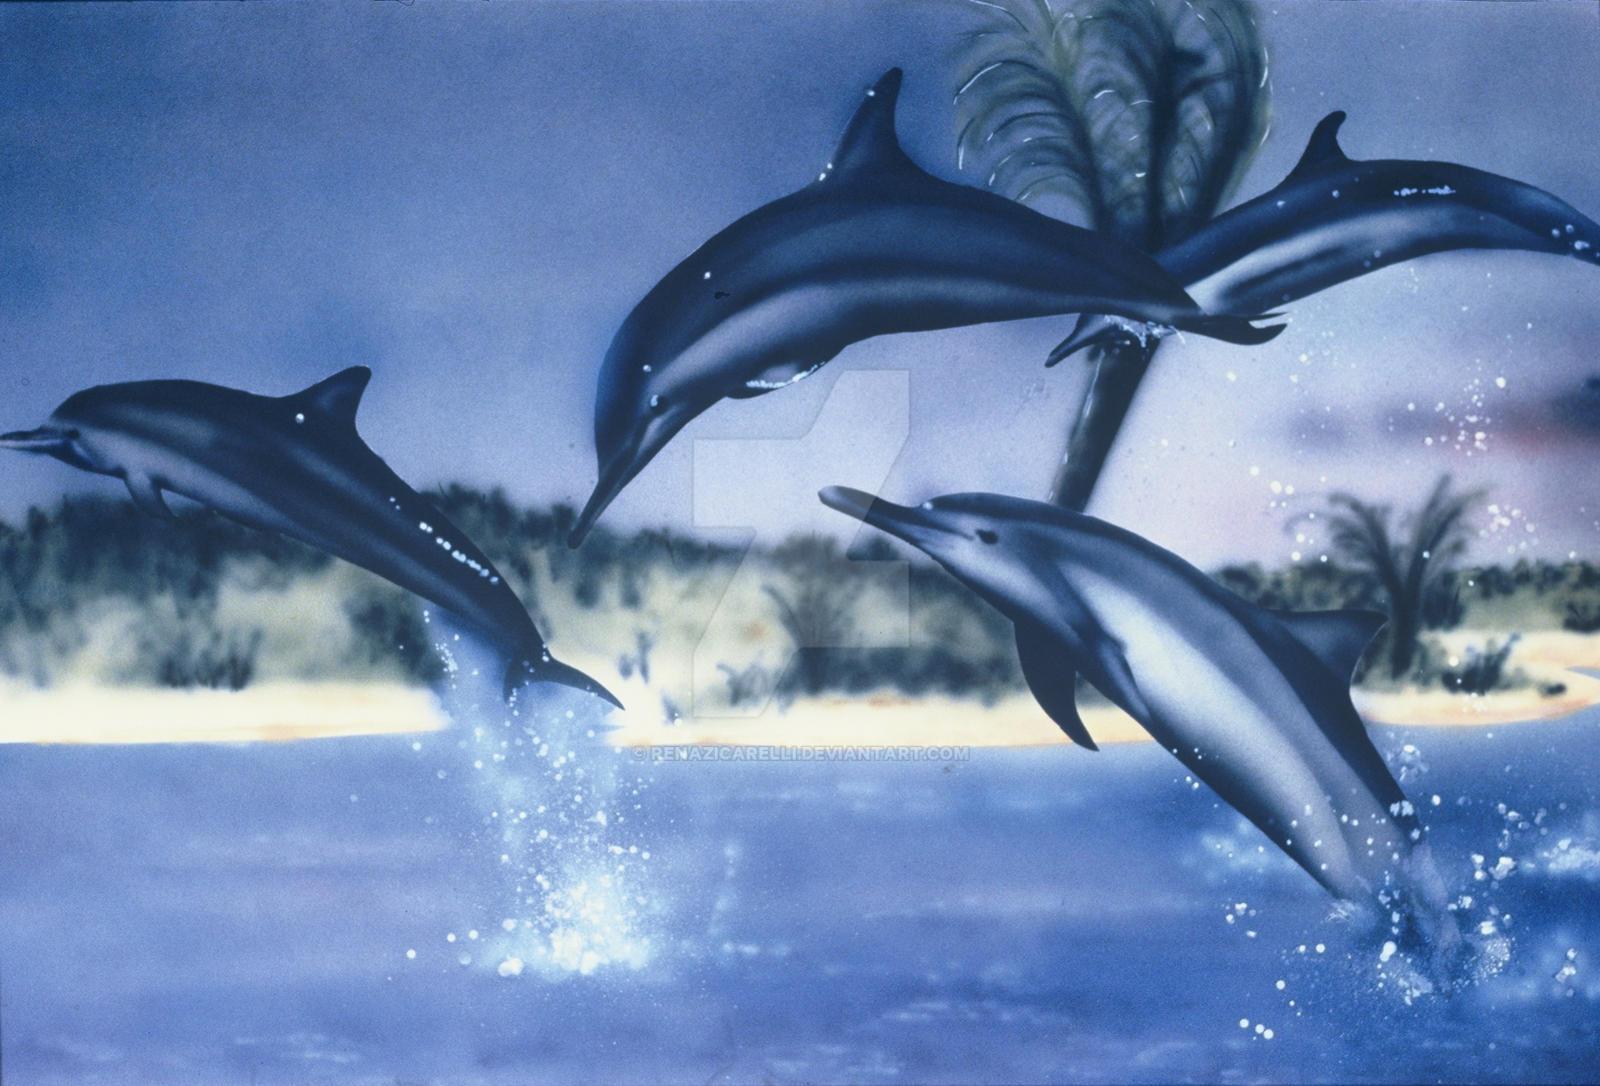 Miami's Dolphins by renazicarelli